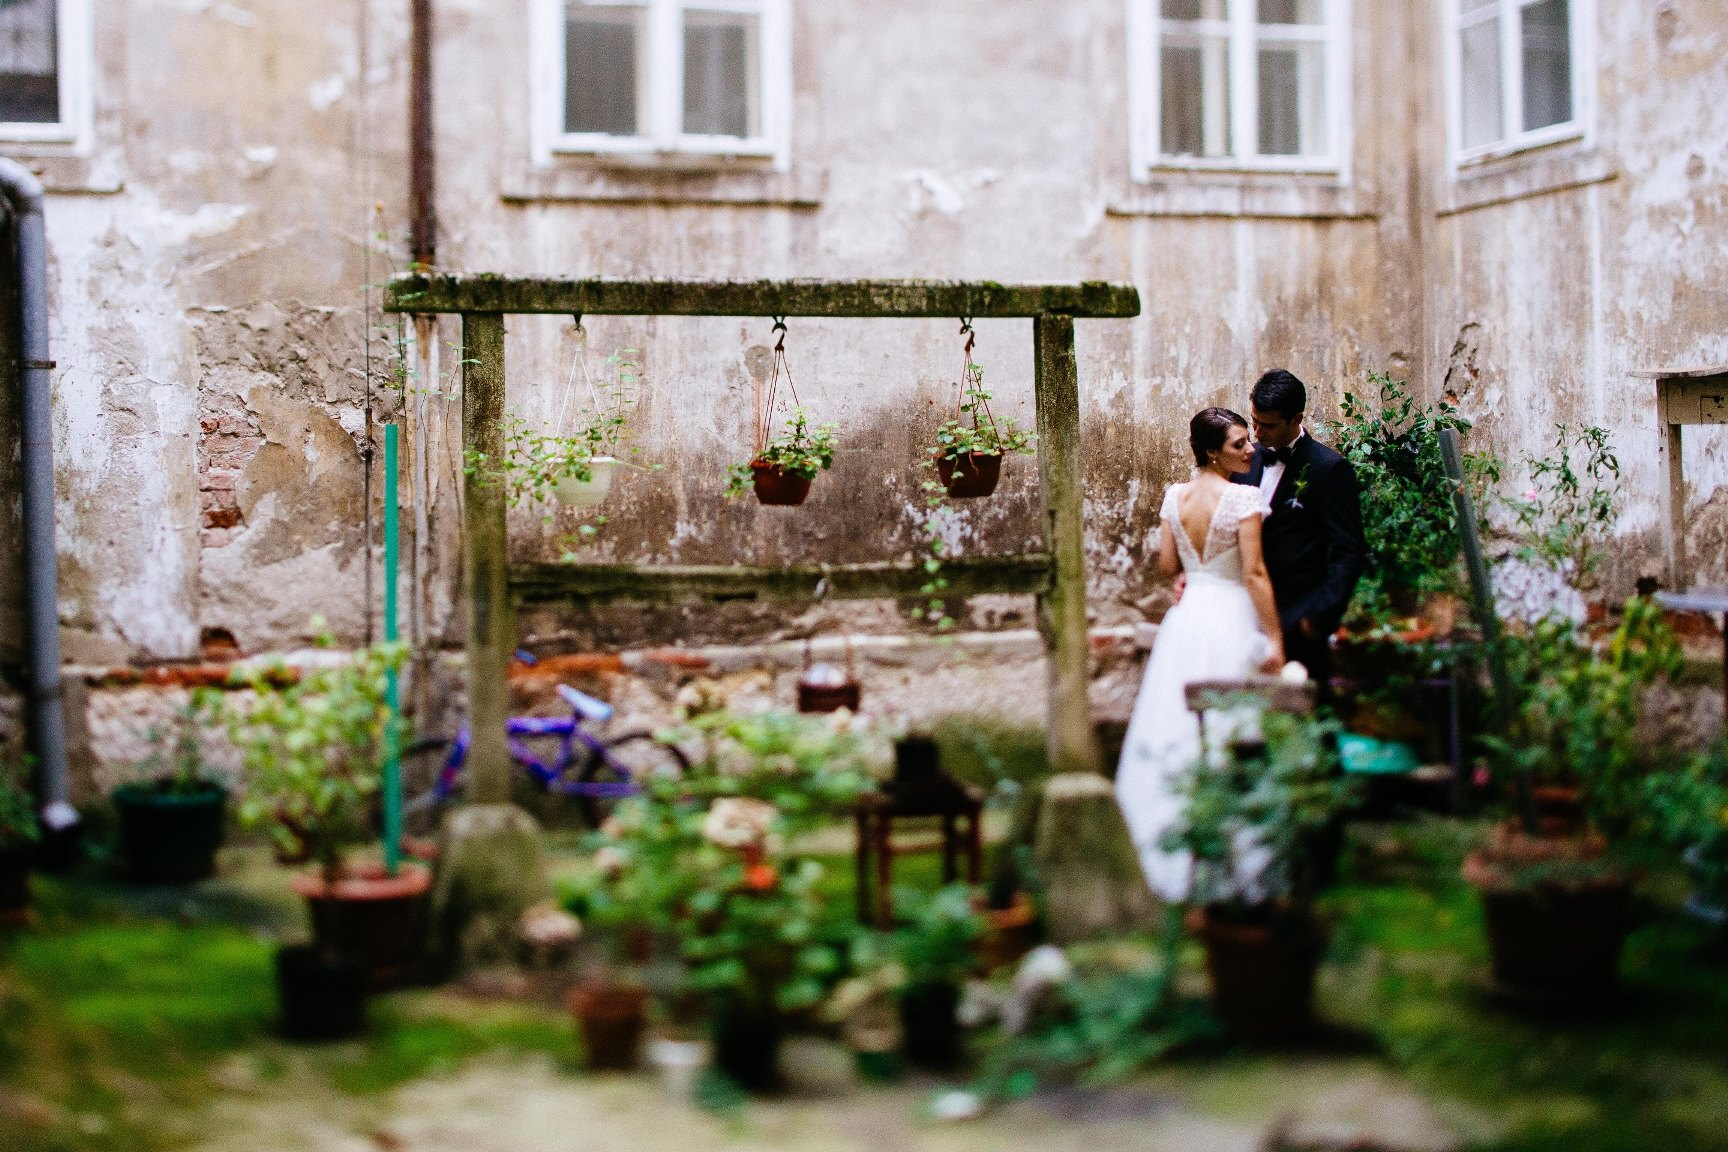 Photographes de mariage Hertfordshire